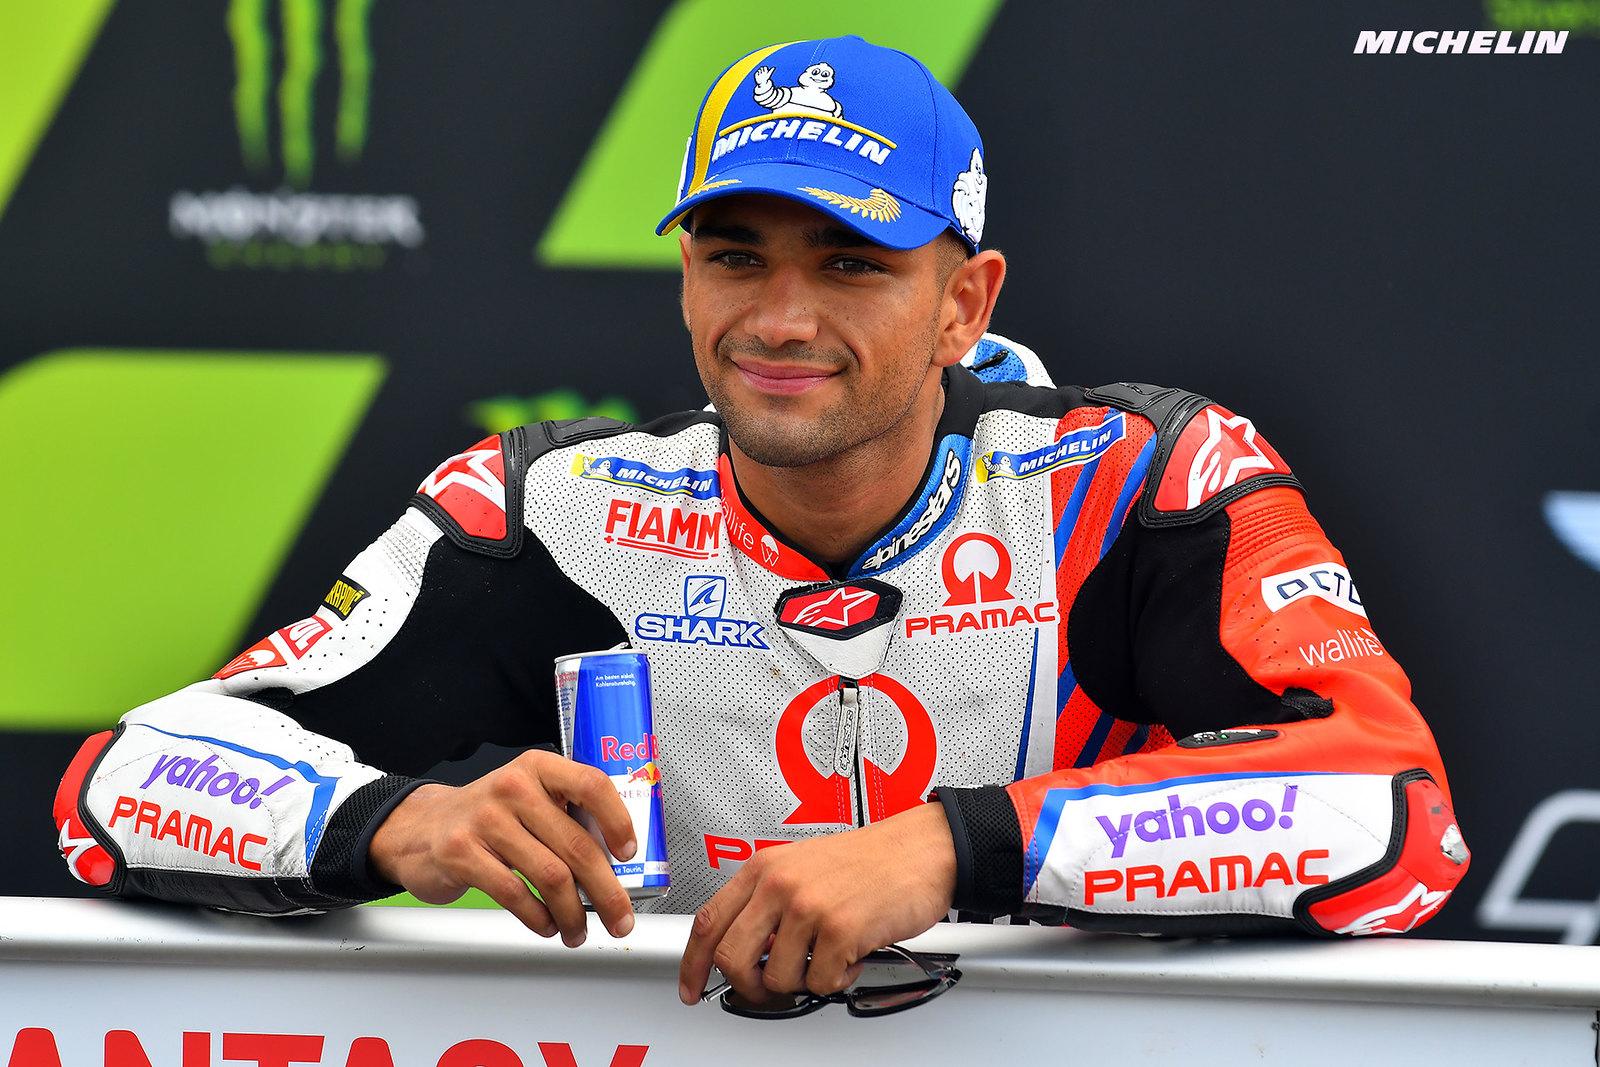 MotoGP2021イギリスGP 予選4位ホルヘ・マルティン「4番グリッドから良いレースが出来ると思う」